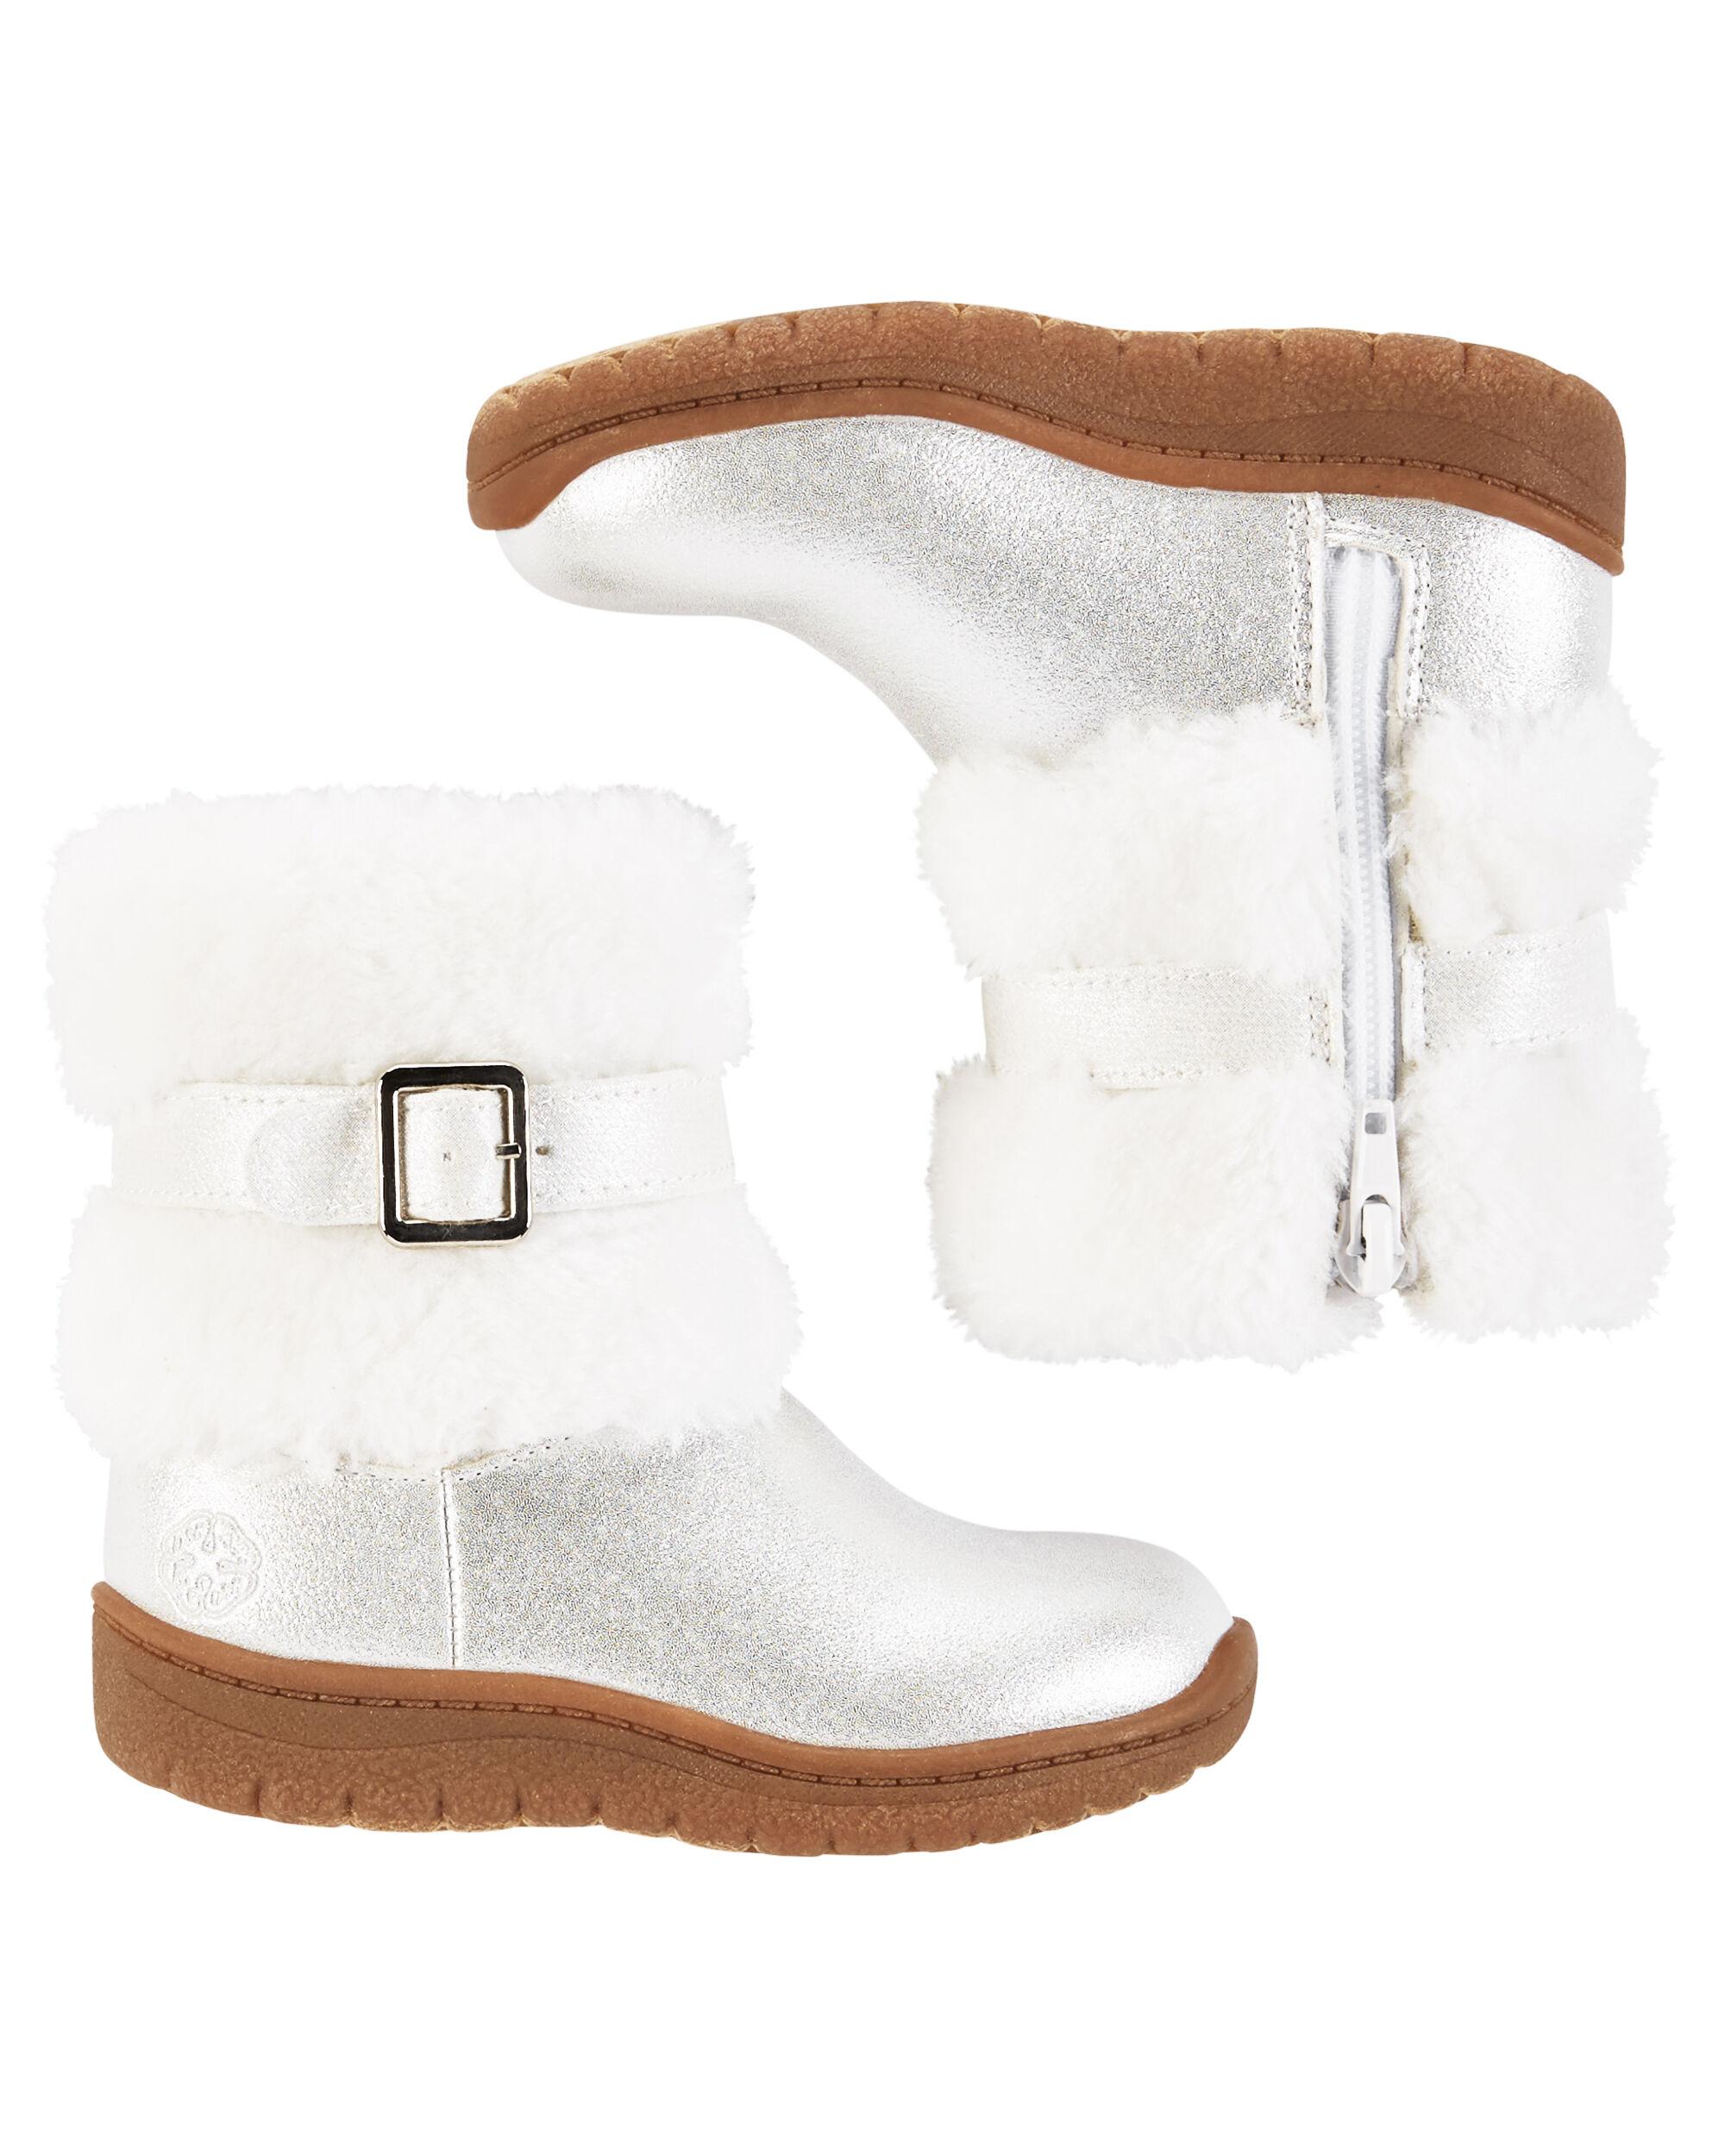 OshKosh Faux Fur Boots | oshkosh.com